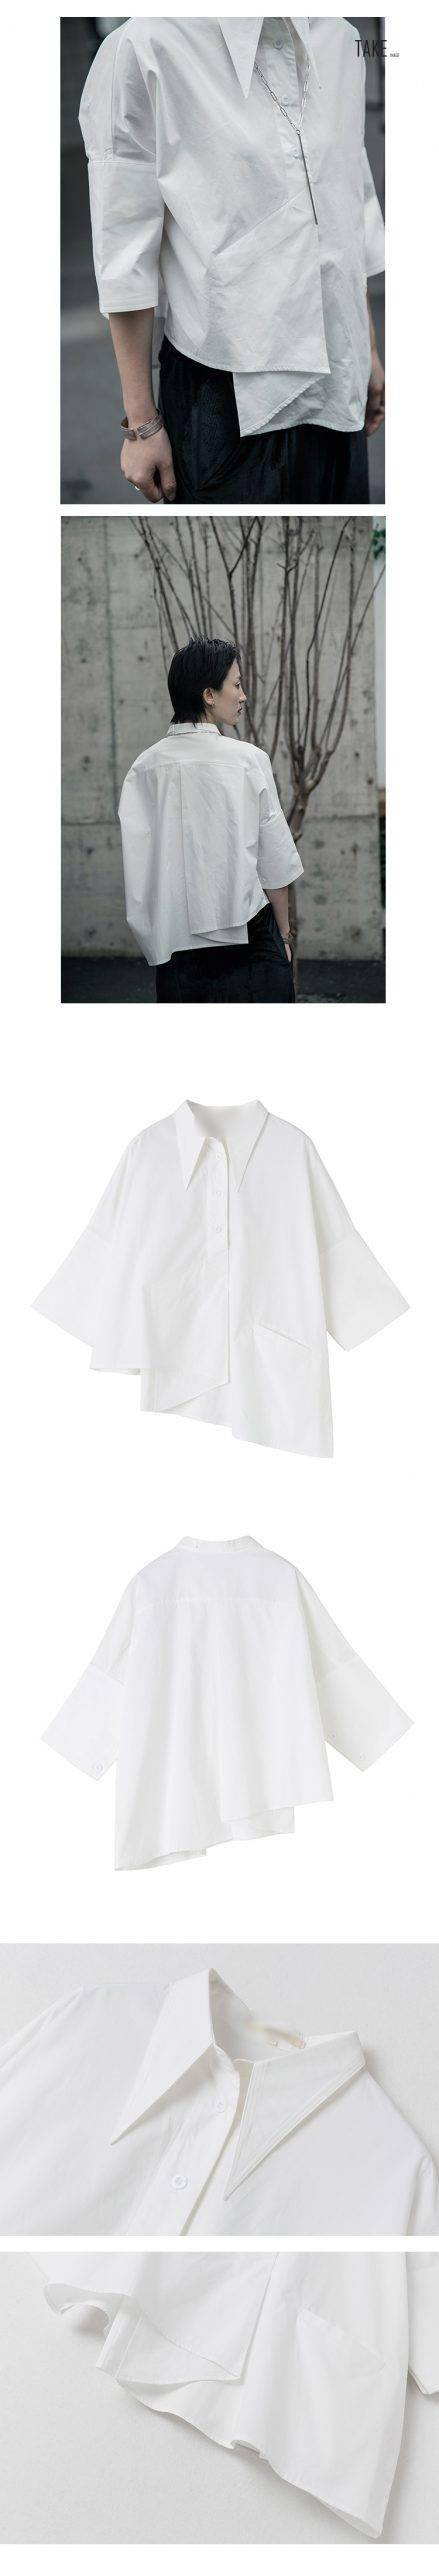 New Fashion Style White Asymmetrical Big Size Blouse Fashion Nova Clothing